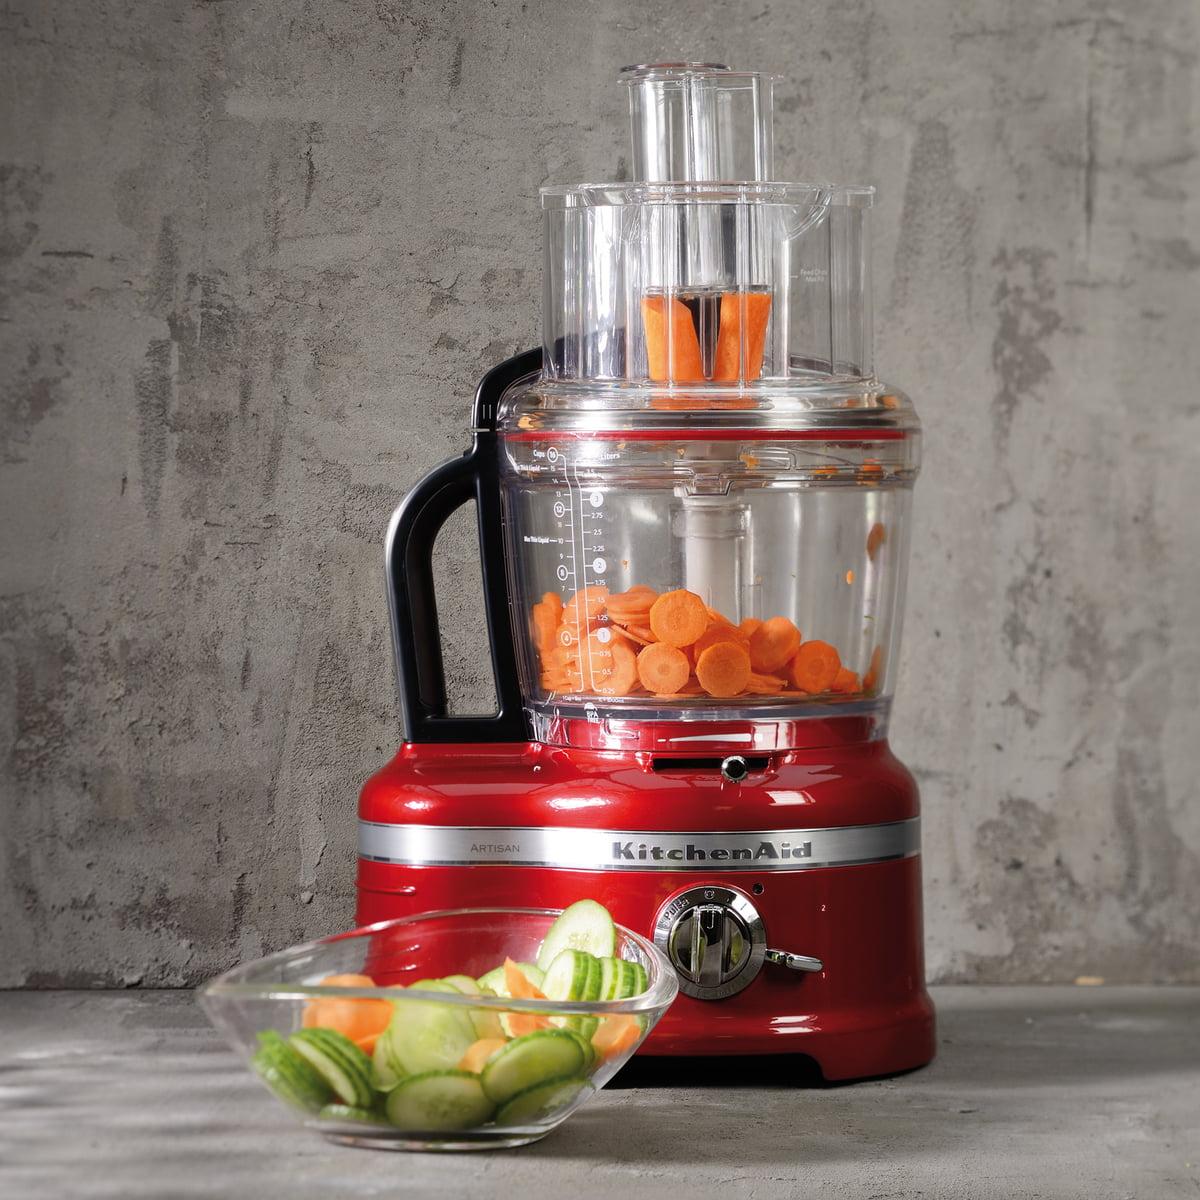 Artisan Food Processor 4,0 l von KitchenAid | Connox